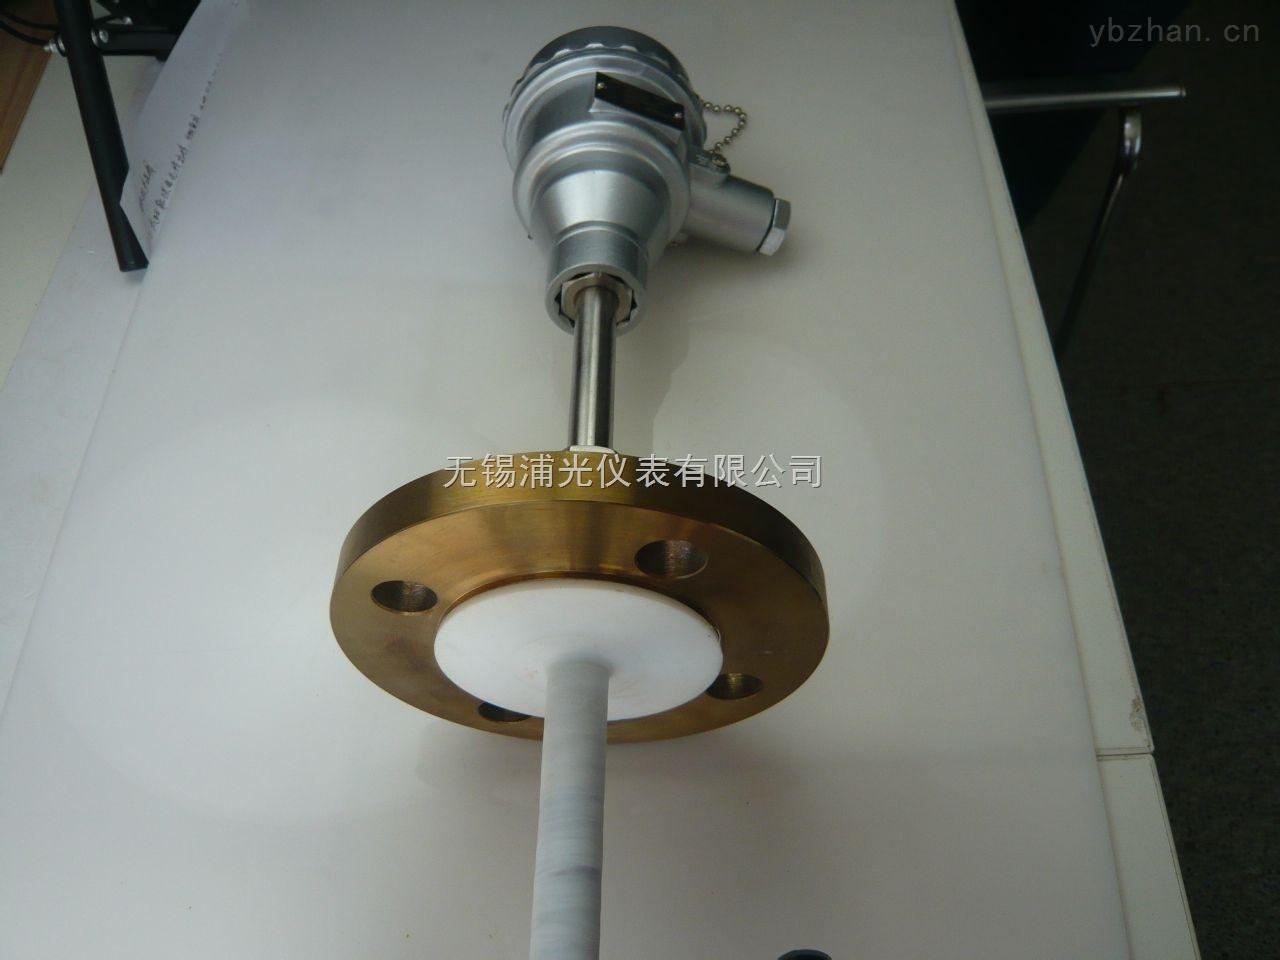 SBWRN-440-江蘇防爆防腐溫度變送器